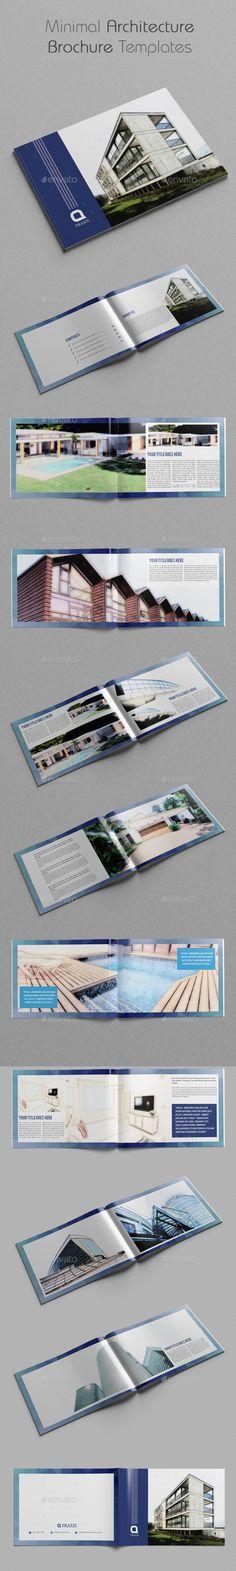 Architecture Brochure Template Ver.Ii | Architecture, Brochure